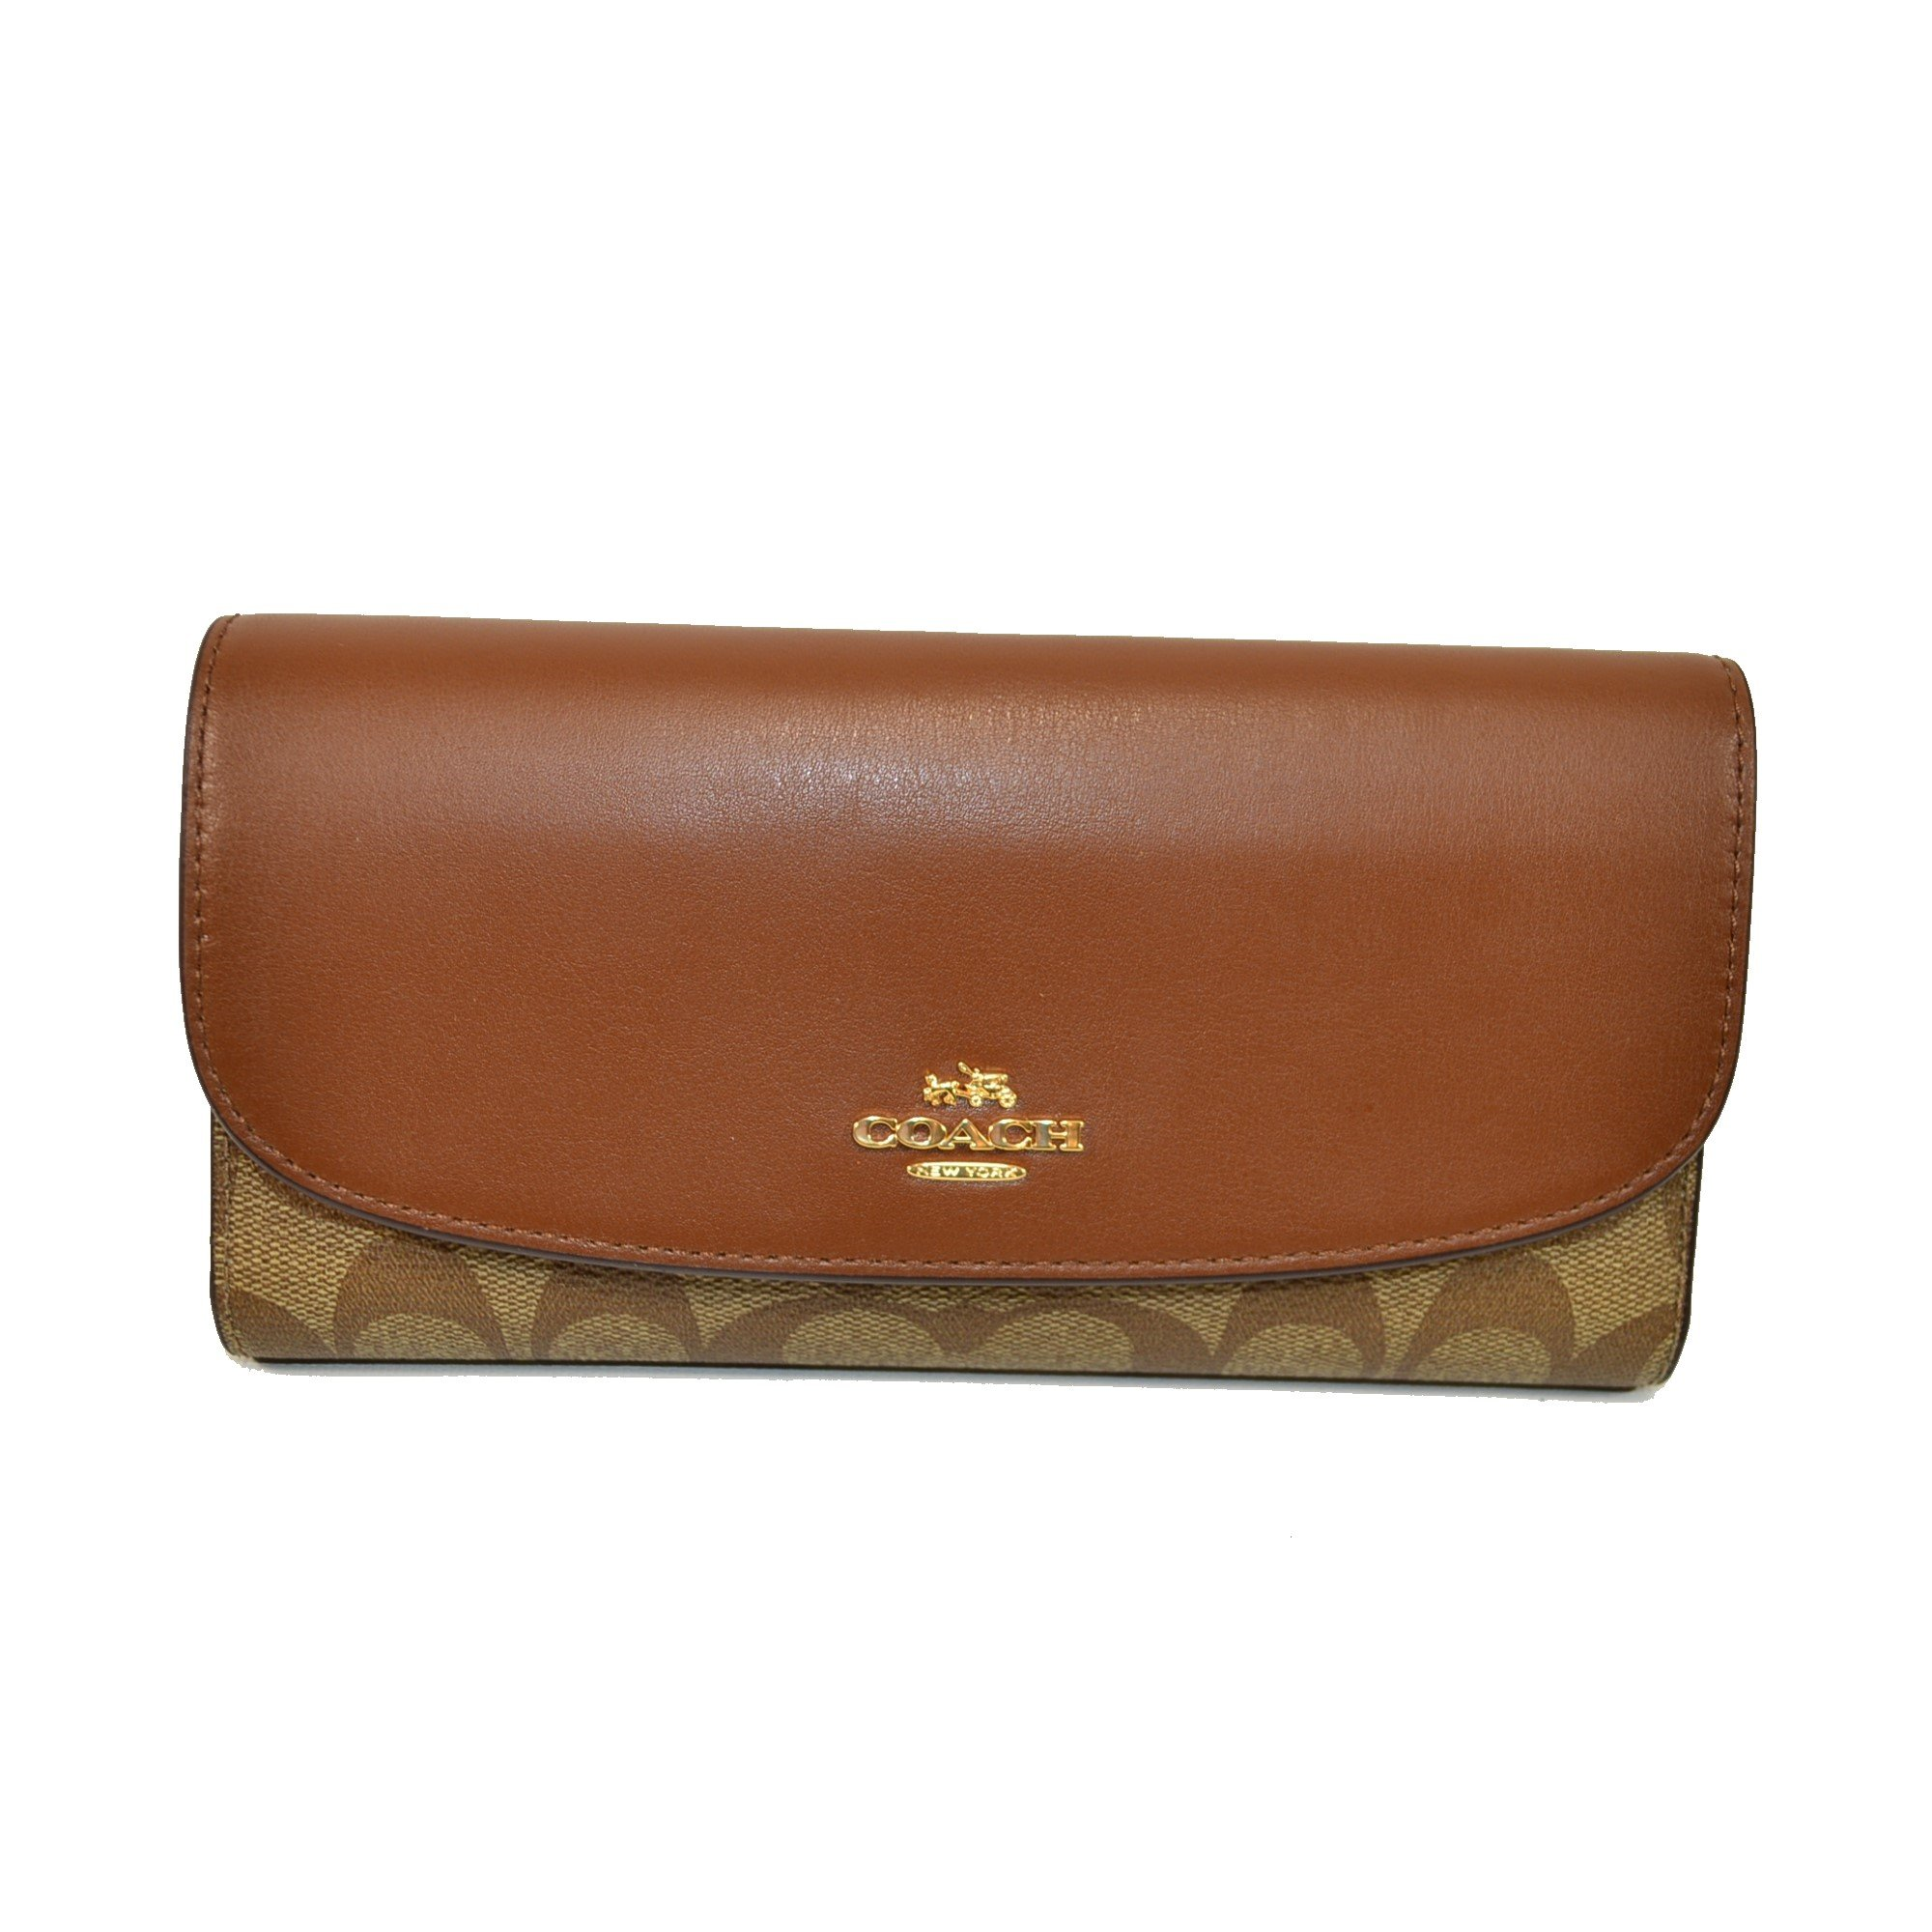 Coach Signature PVC Checkbook Wallet Khaki / Saddle F57319